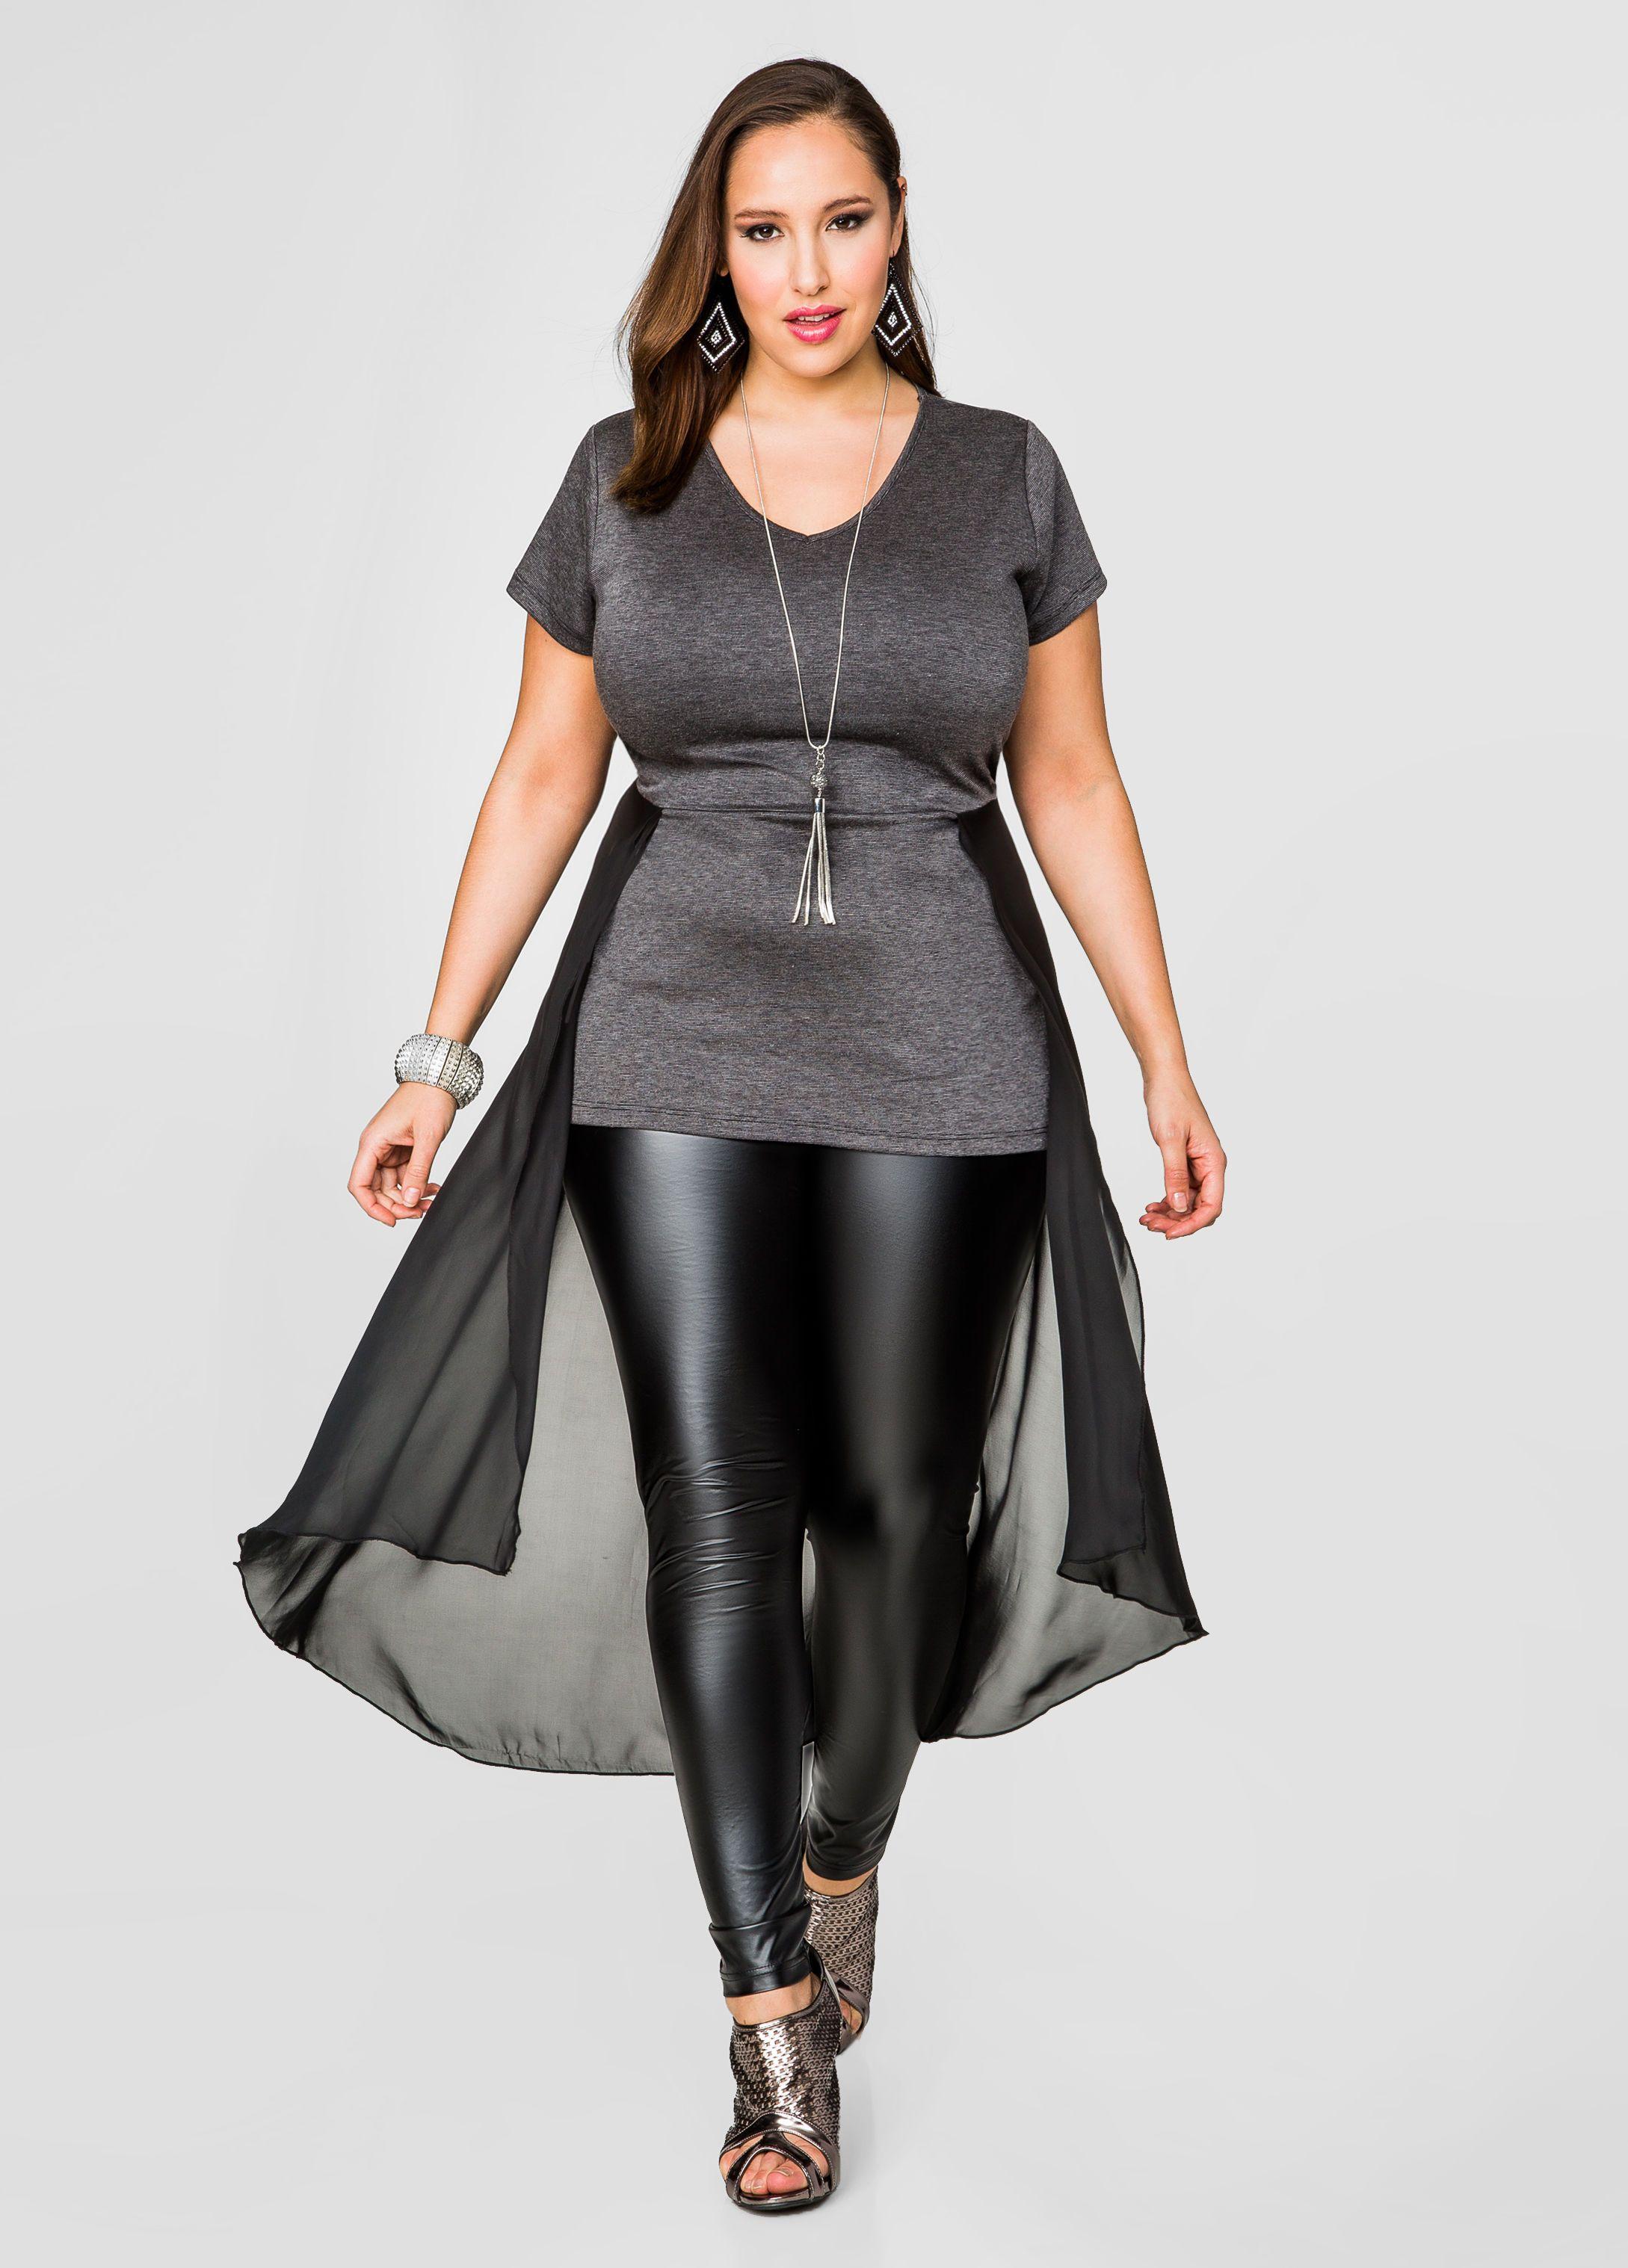 3882ea8a22a Clearance Womens Plus-Size Clothing On Sale. Chiffon Duster Peplum Top - Ashley  Stewart